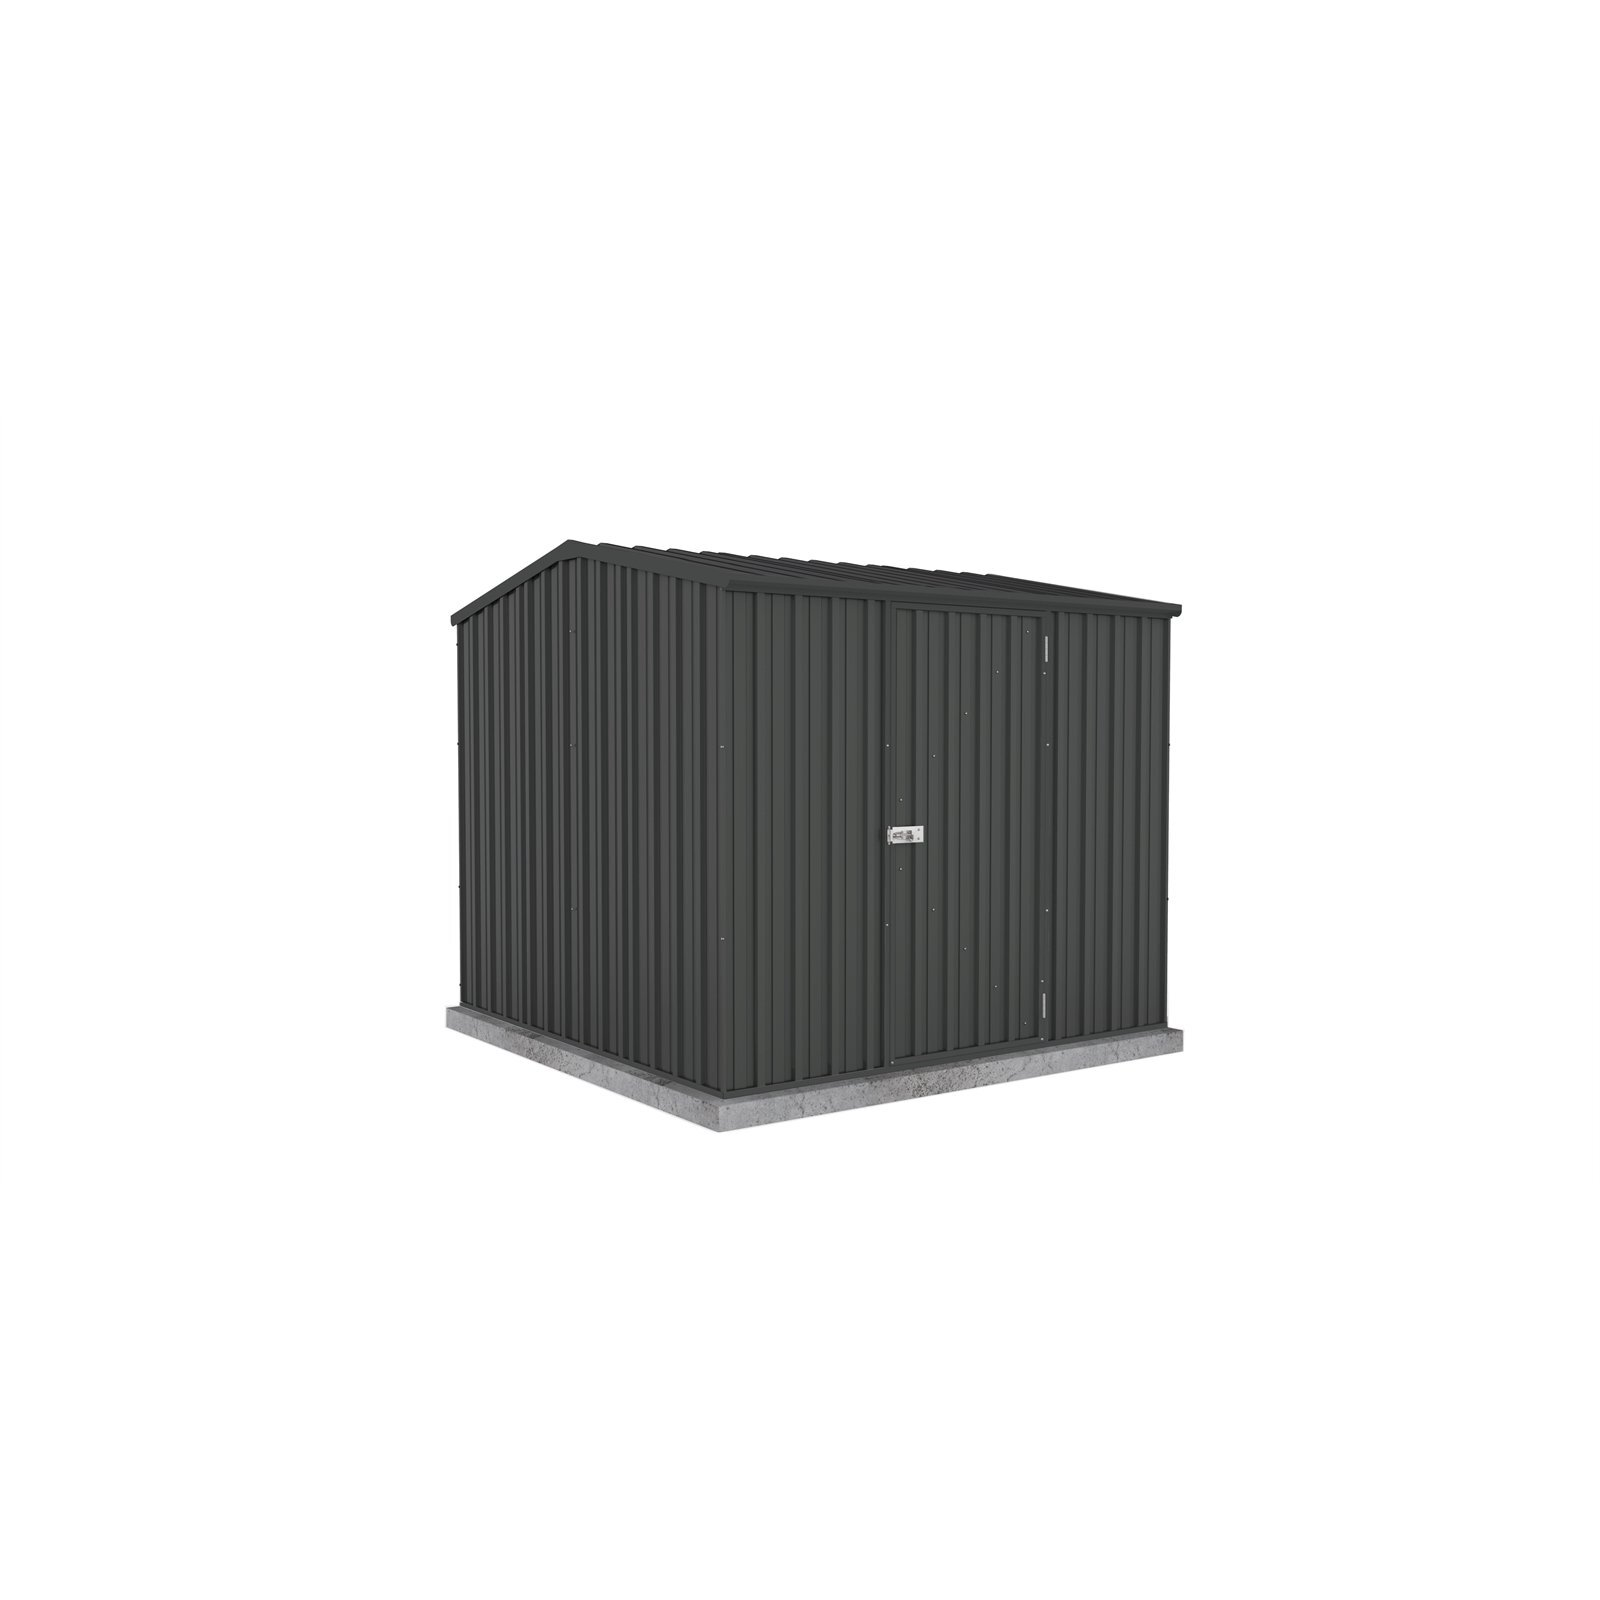 Absco Sheds 2.26 x 2.26 x 2m Premier Single Door Garden Shed - Monument